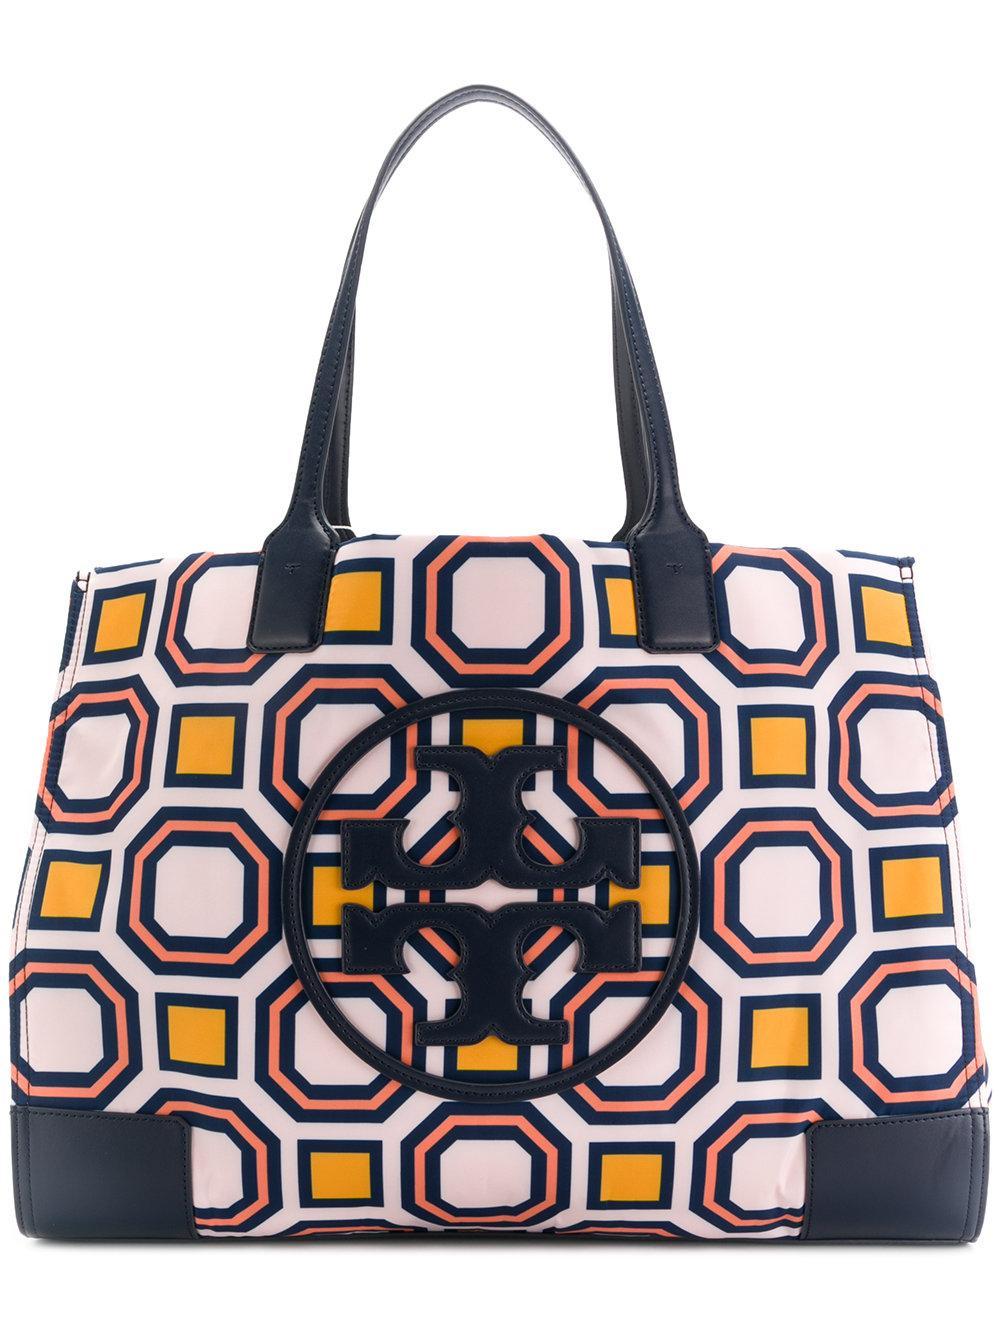 5712347efb5f Tory Burch Mini Ella Octagon Print Nylon Tote - Pink In Vivid Orange Octagon  Square